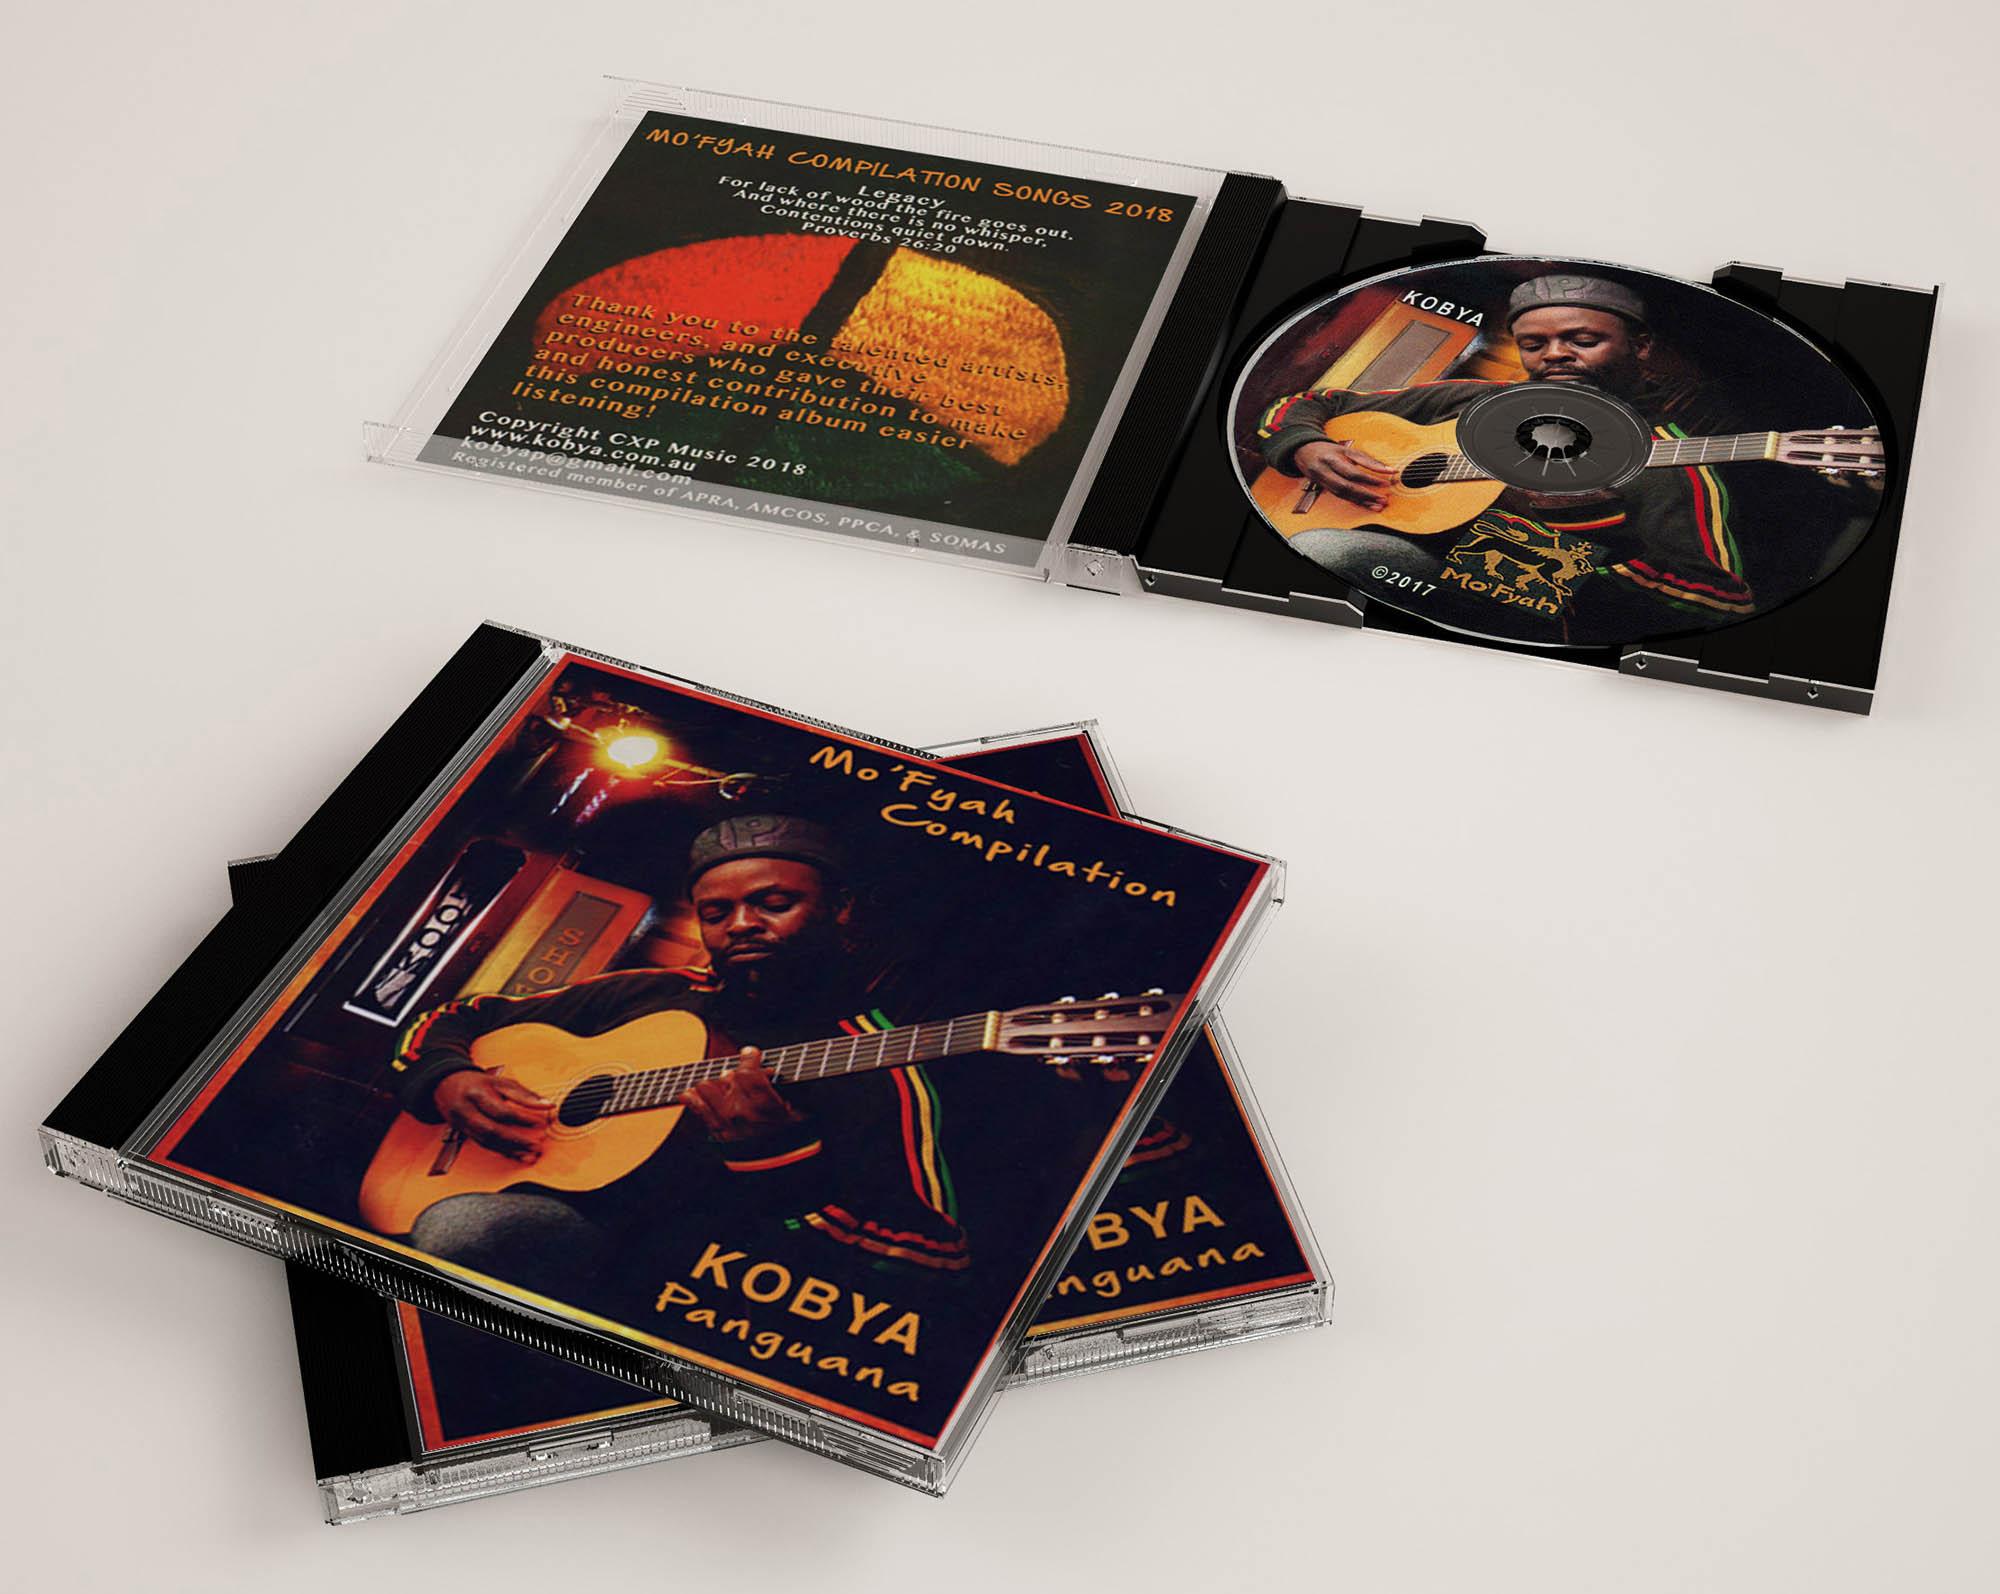 Mo'Fyah Compilation CD